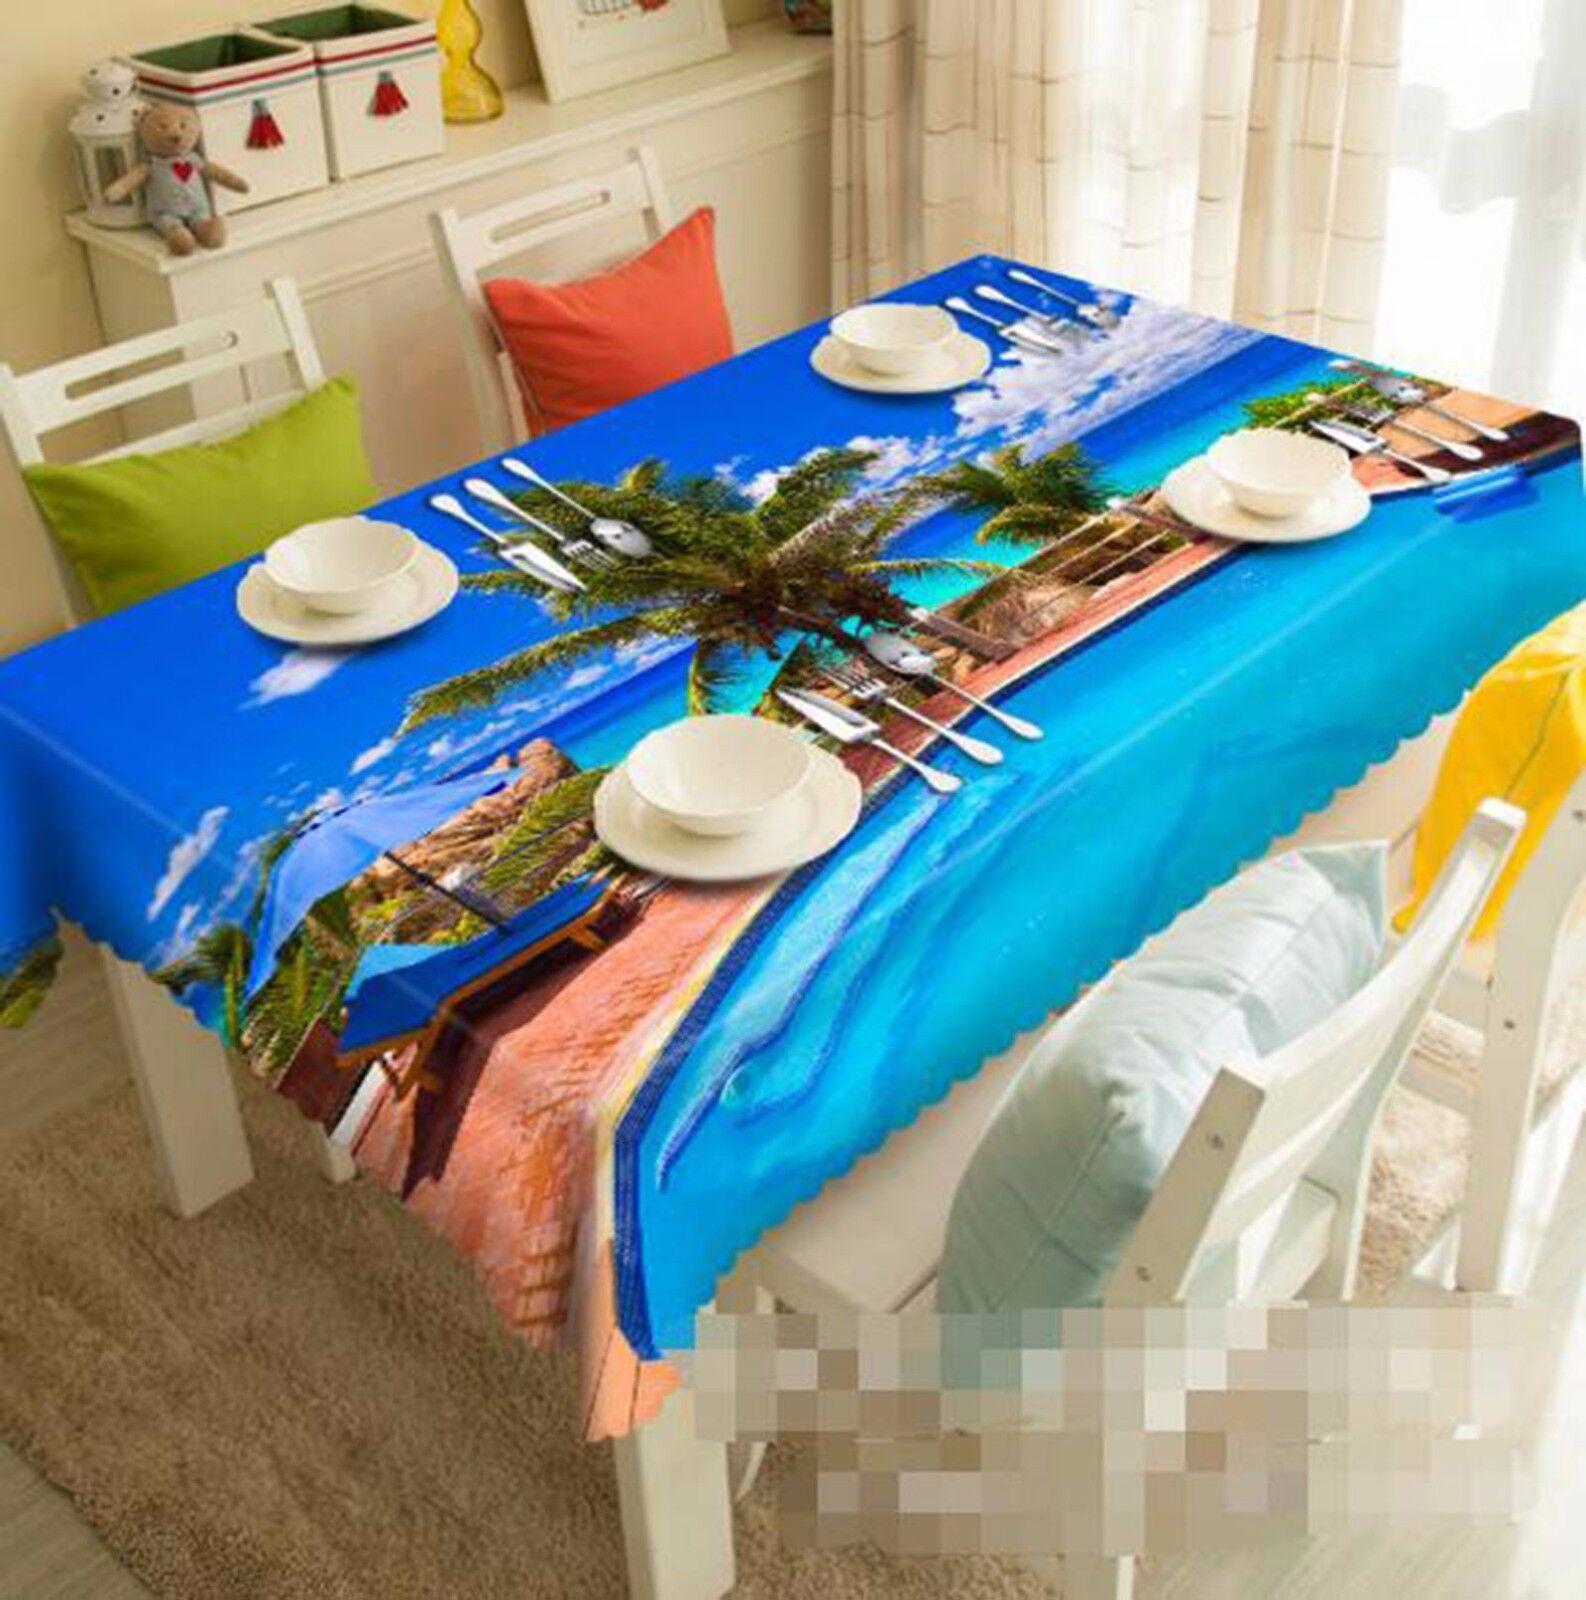 3D Pond Bule Tablecloth Table Cover Cloth Birthday Party AJ WALLPAPER UK Lemon